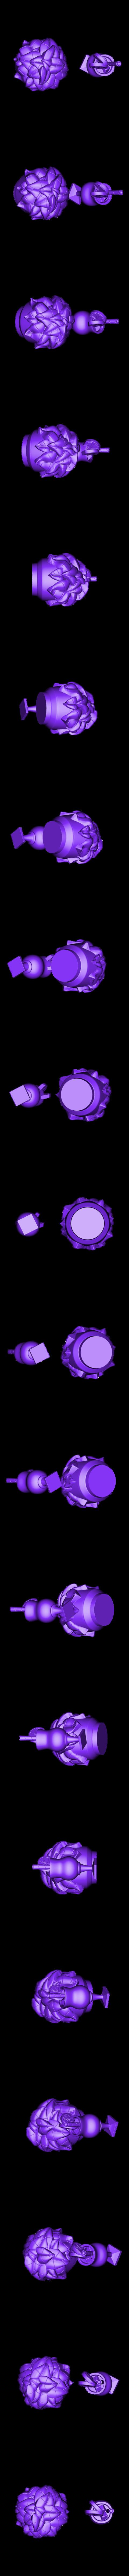 MP_Klint_Accessories_.stl Download free STL file Klint the Chameleon • 3D printing design, MagicEddy